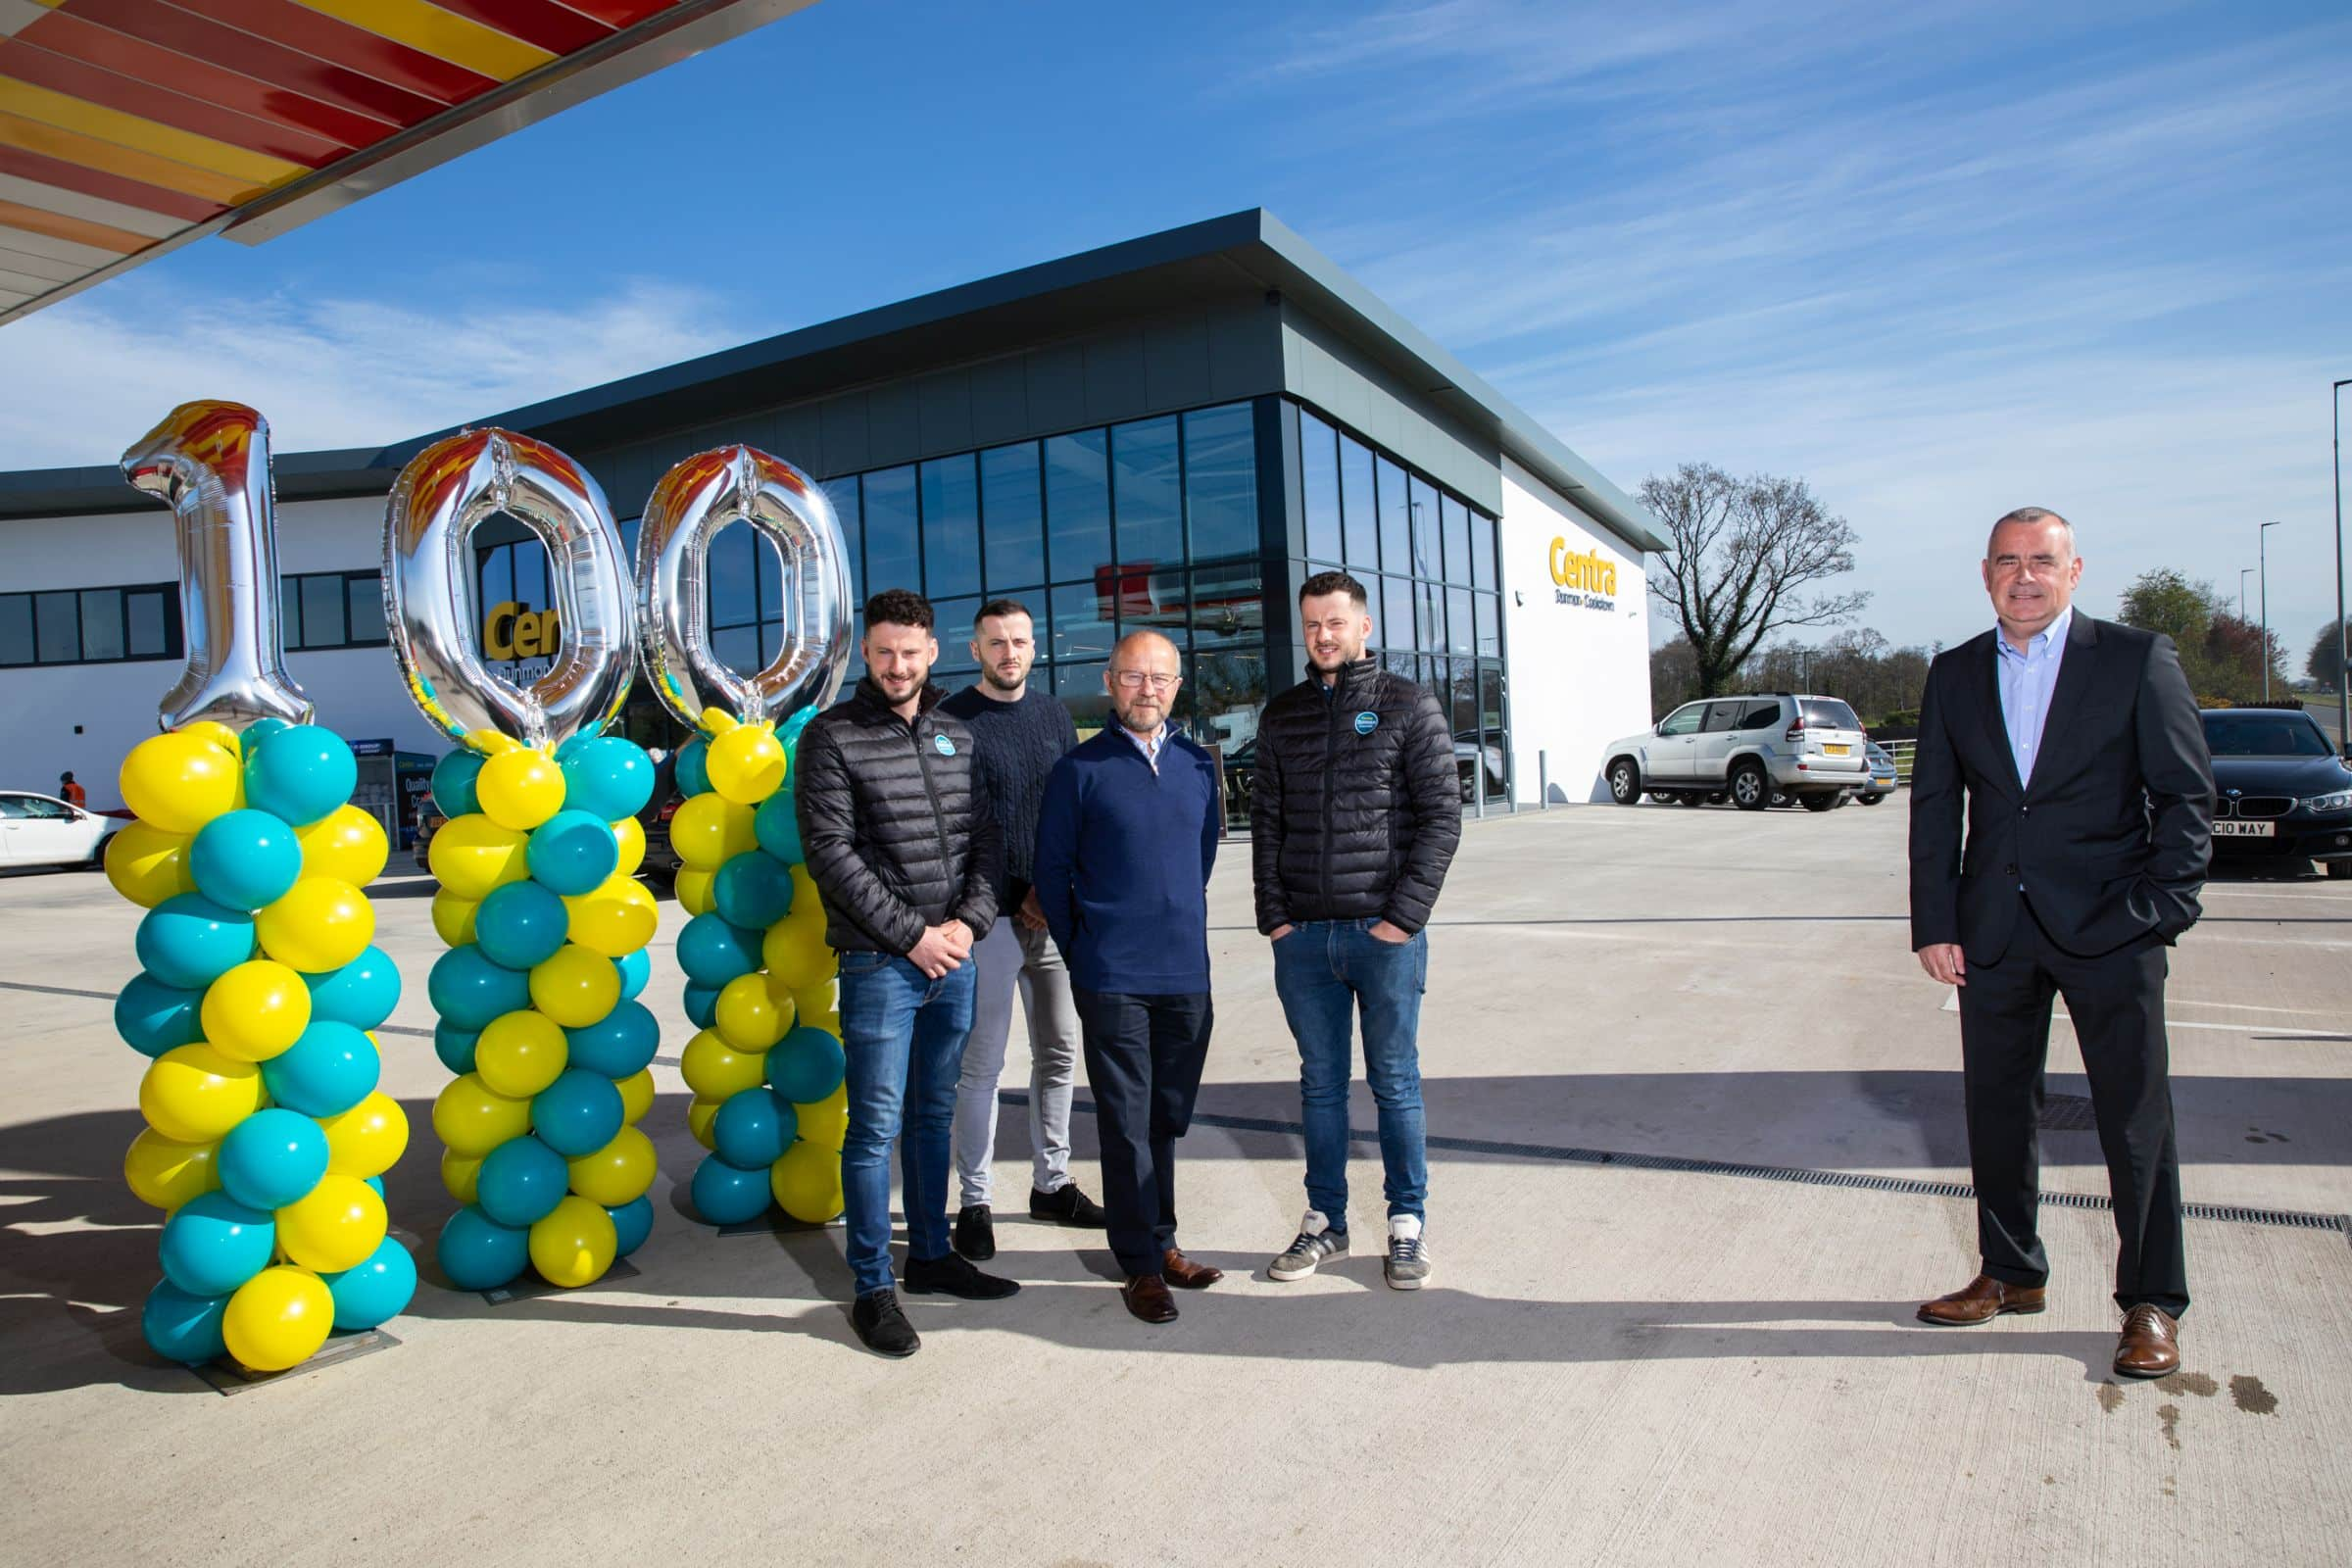 Centra Reaches Landmark 100th Store in Northern Ireland